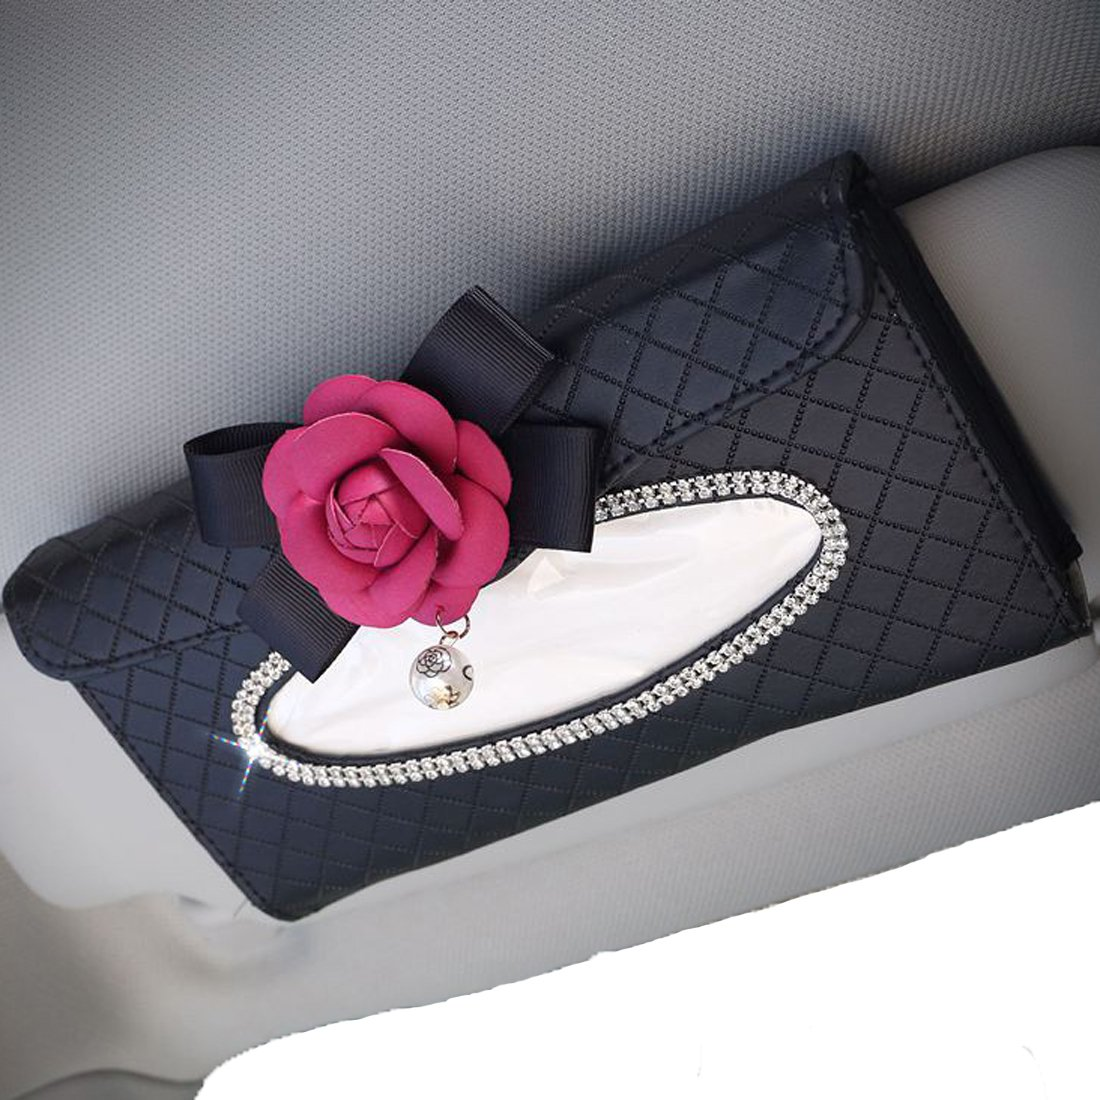 Calcifer Auto Car Sun Visor Tissue Box Handy Paper Napkin Holder Clip Rose and Pearls Decorate Red